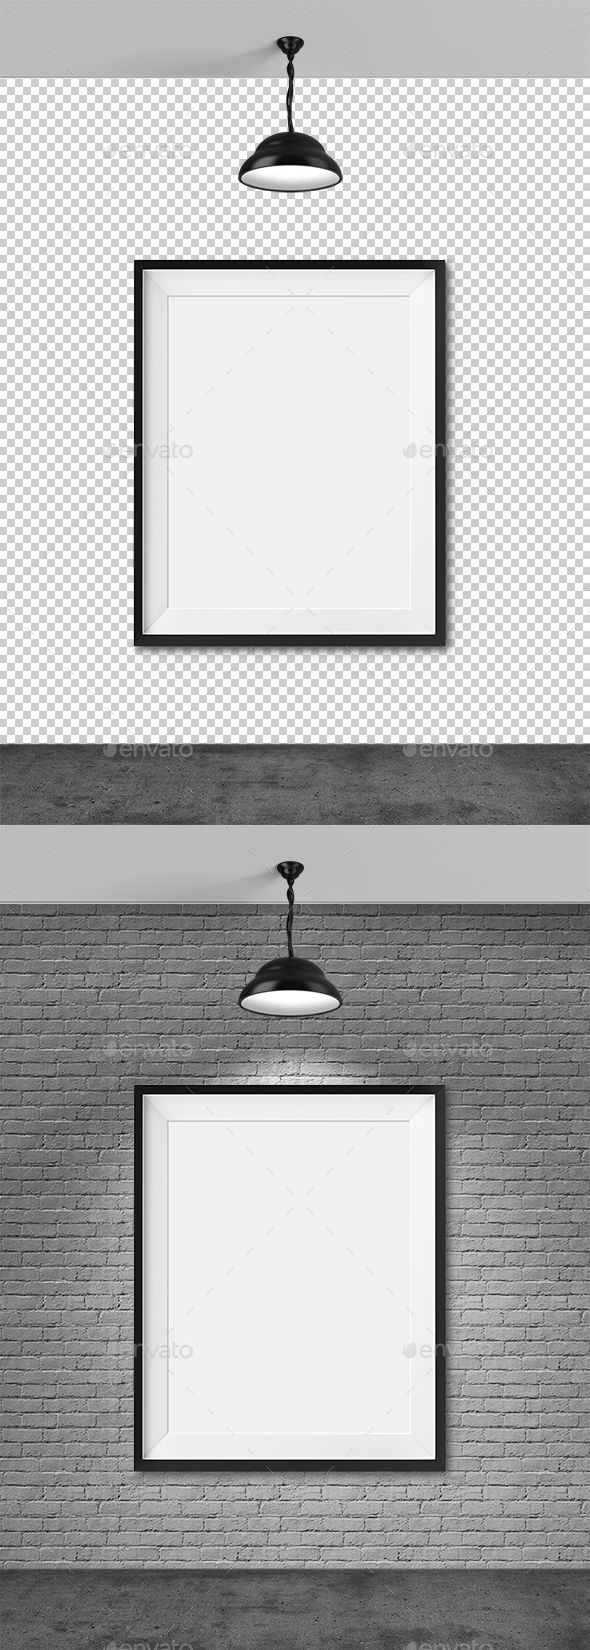 Blank Frame | Brick wall background, Photoshop and Font logo